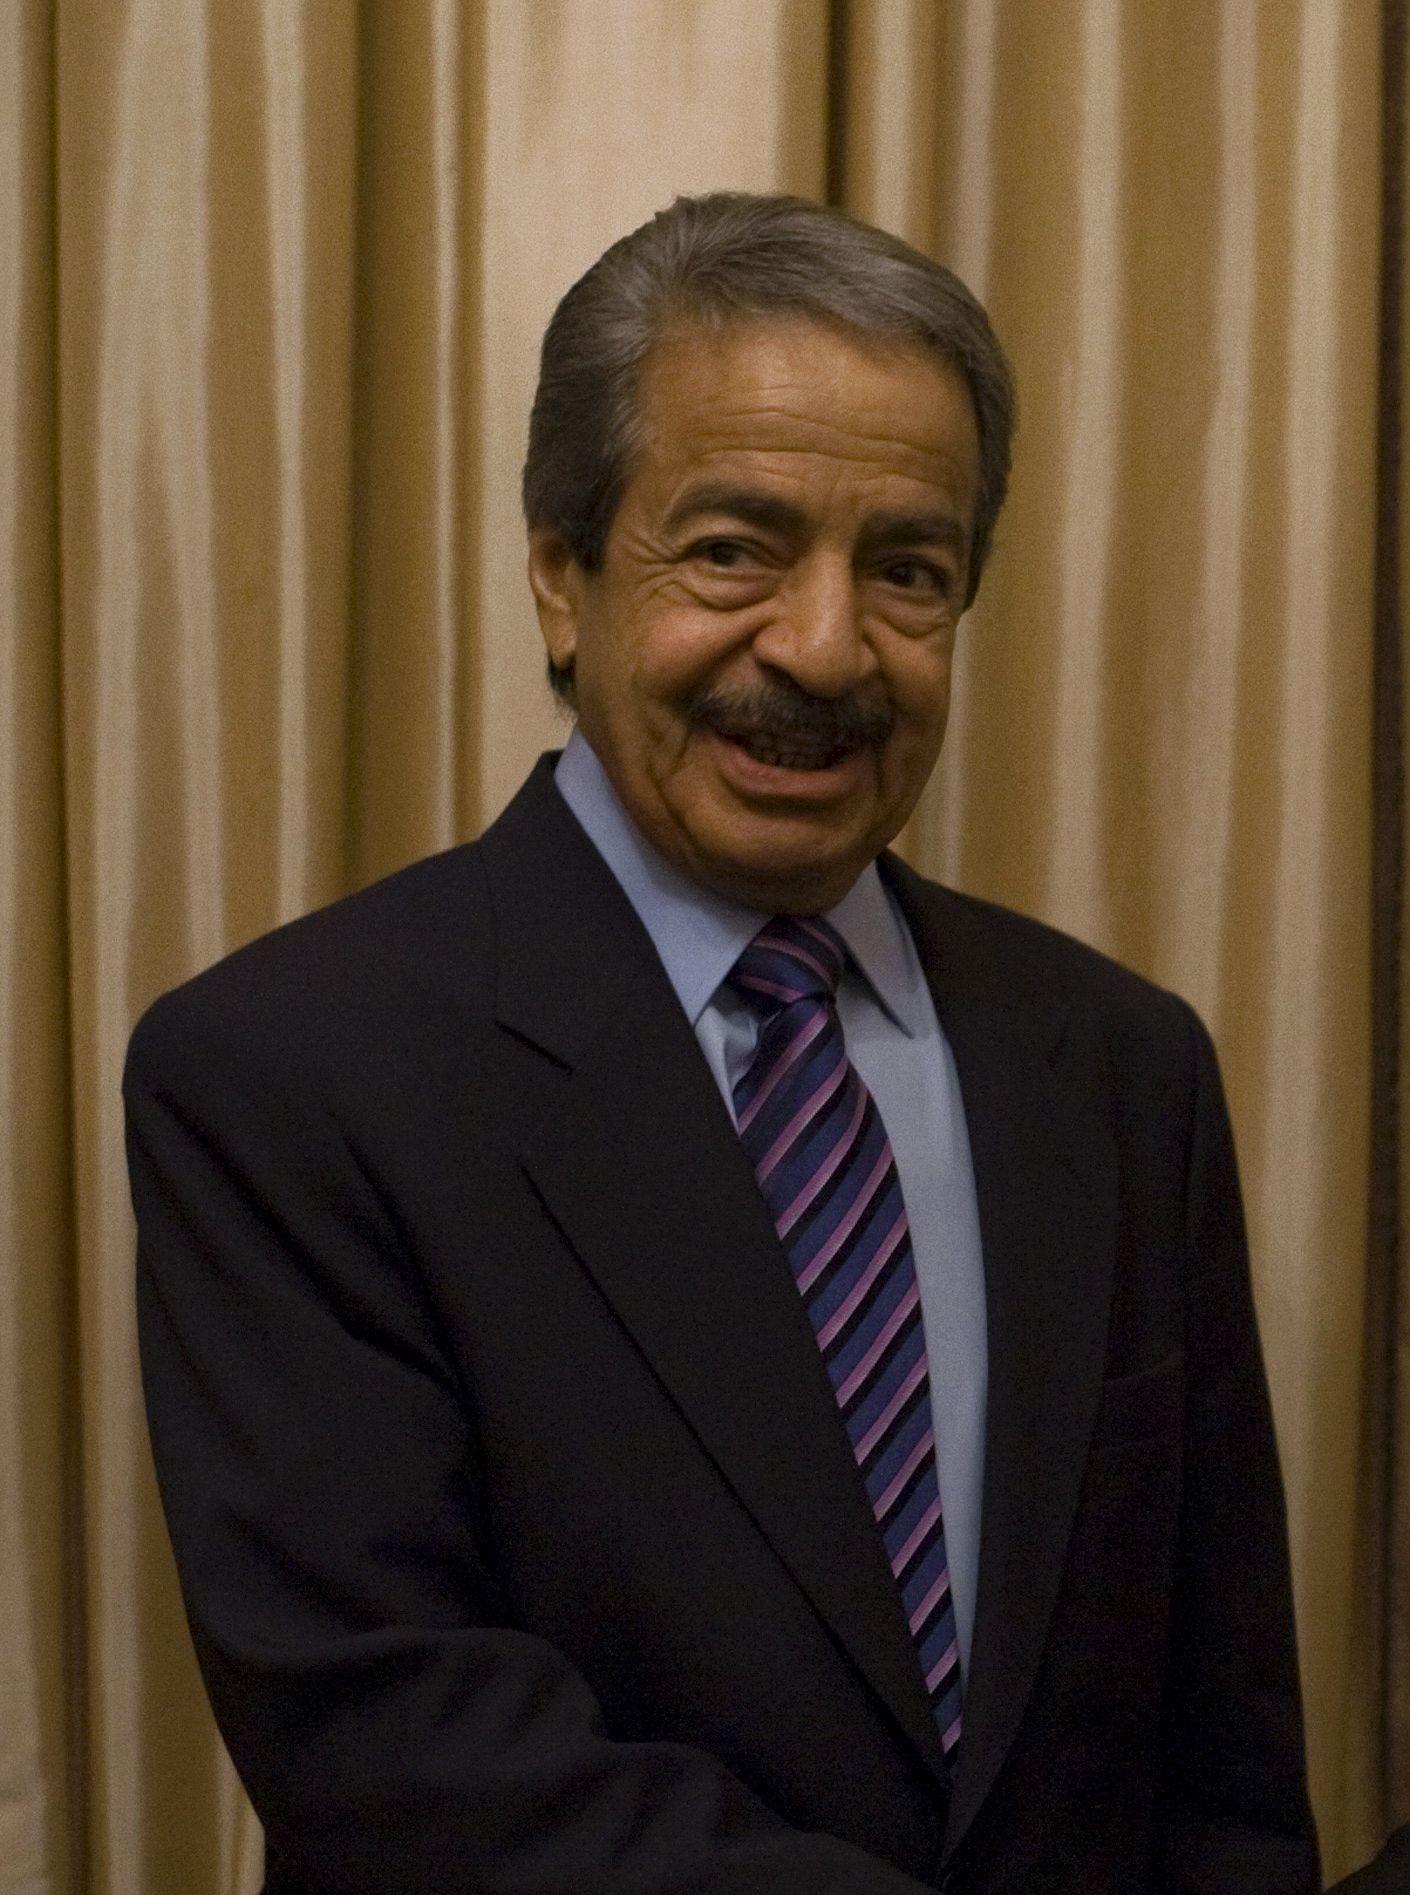 Салман аль утайби 9 фотография